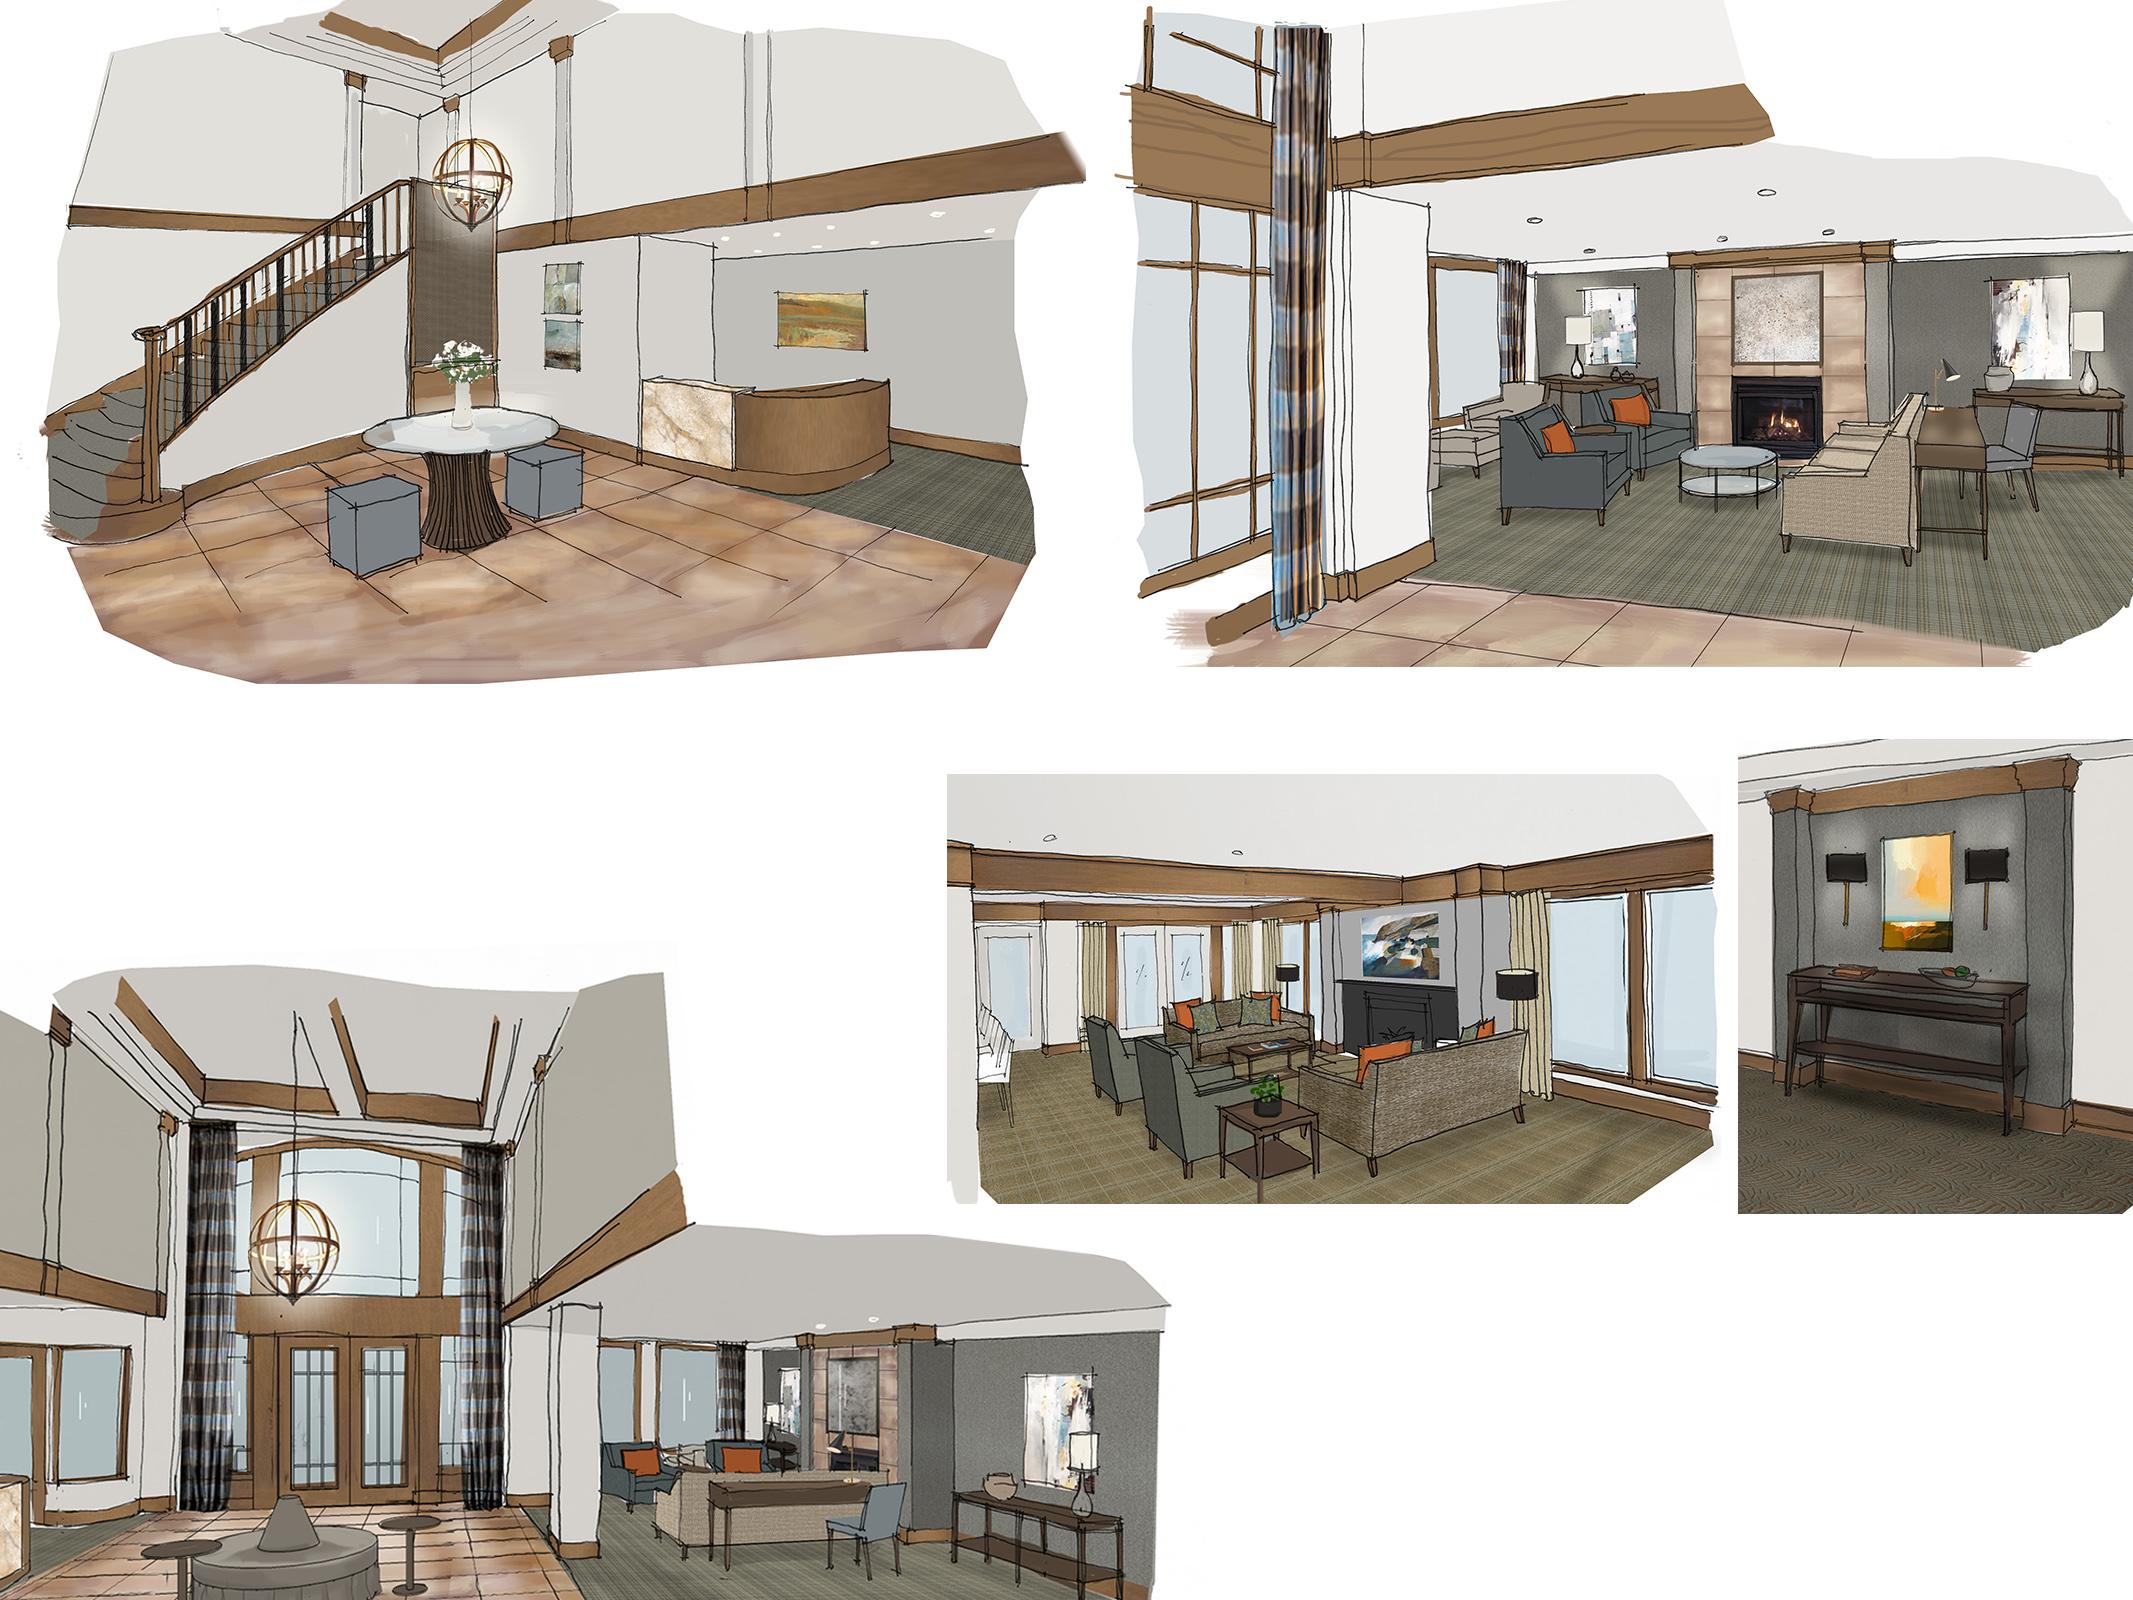 Ballard Place Condominiums : Schematic design